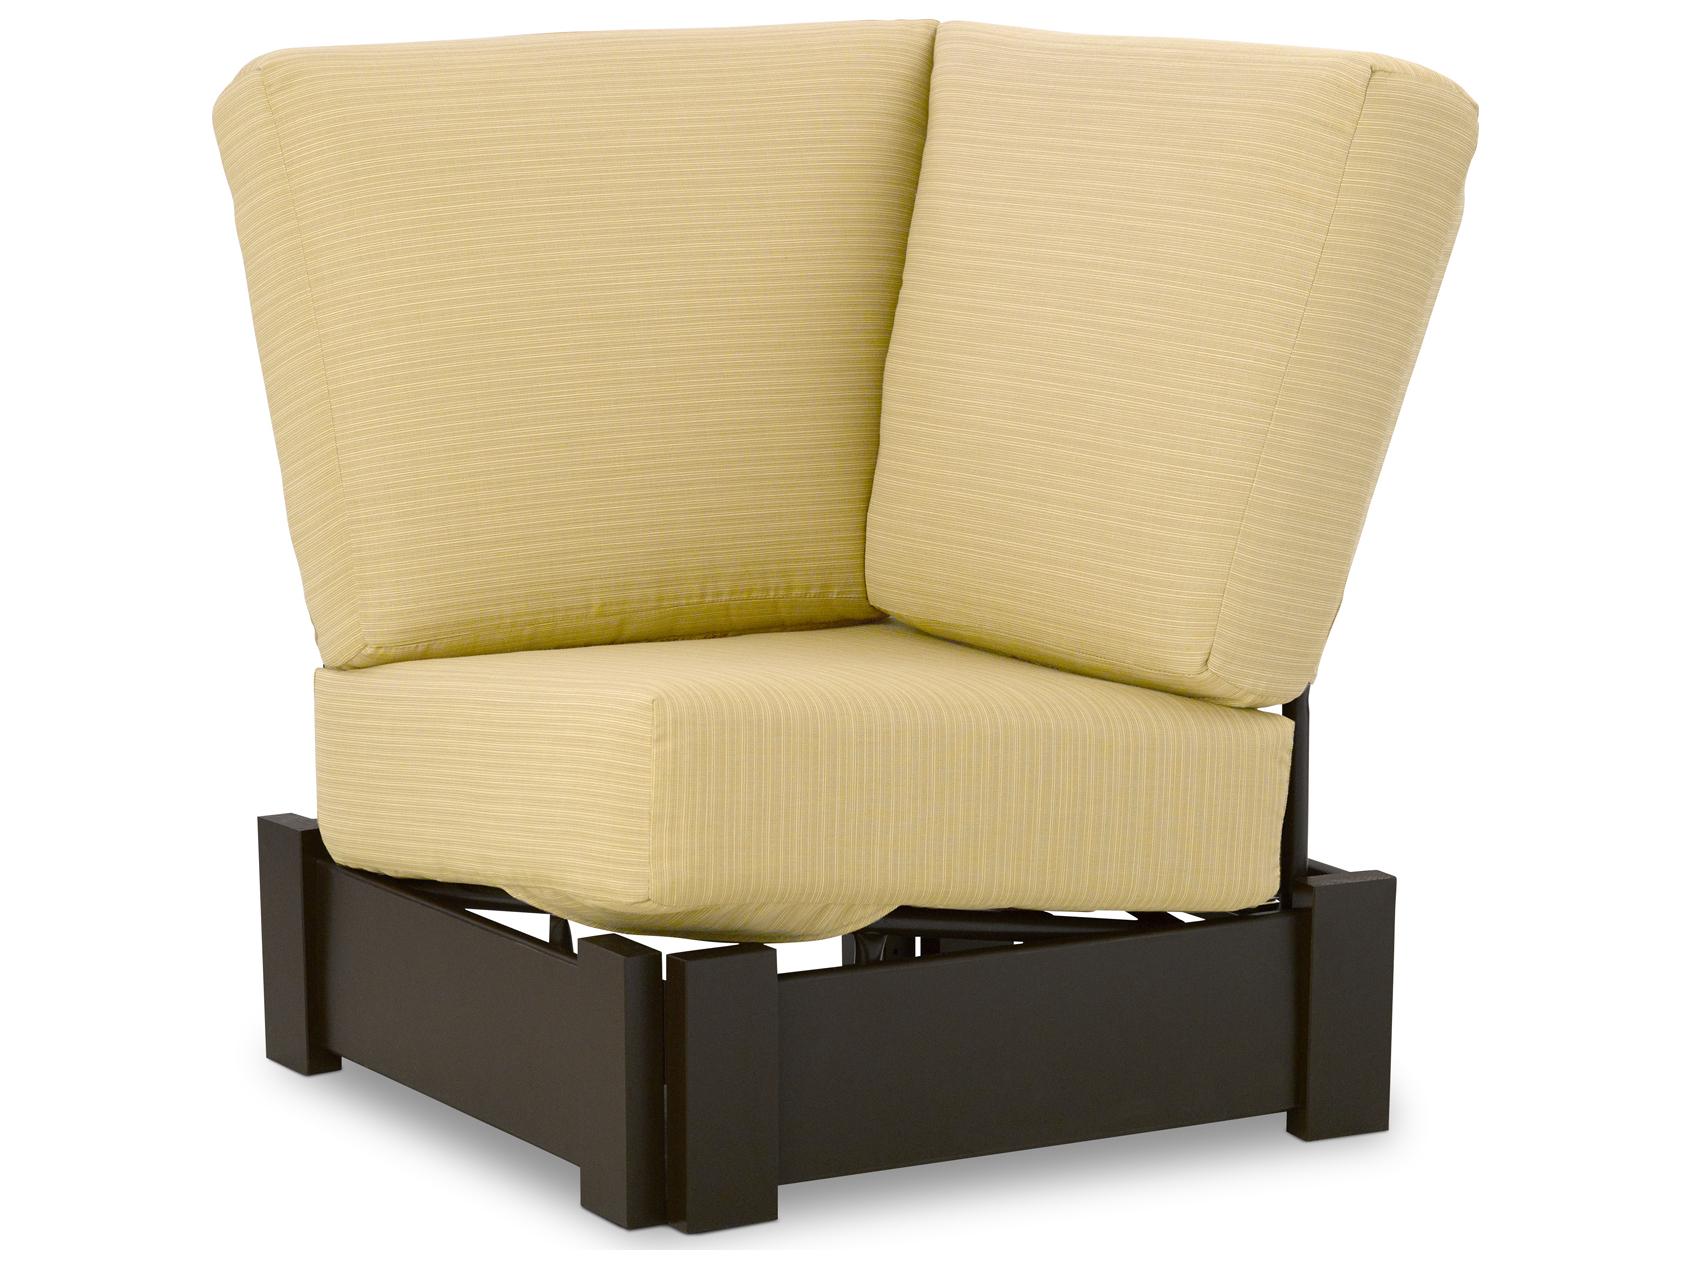 Telescope casual leeward mgp deep seat corner fixed - Deep seat patio cushions replacements ...